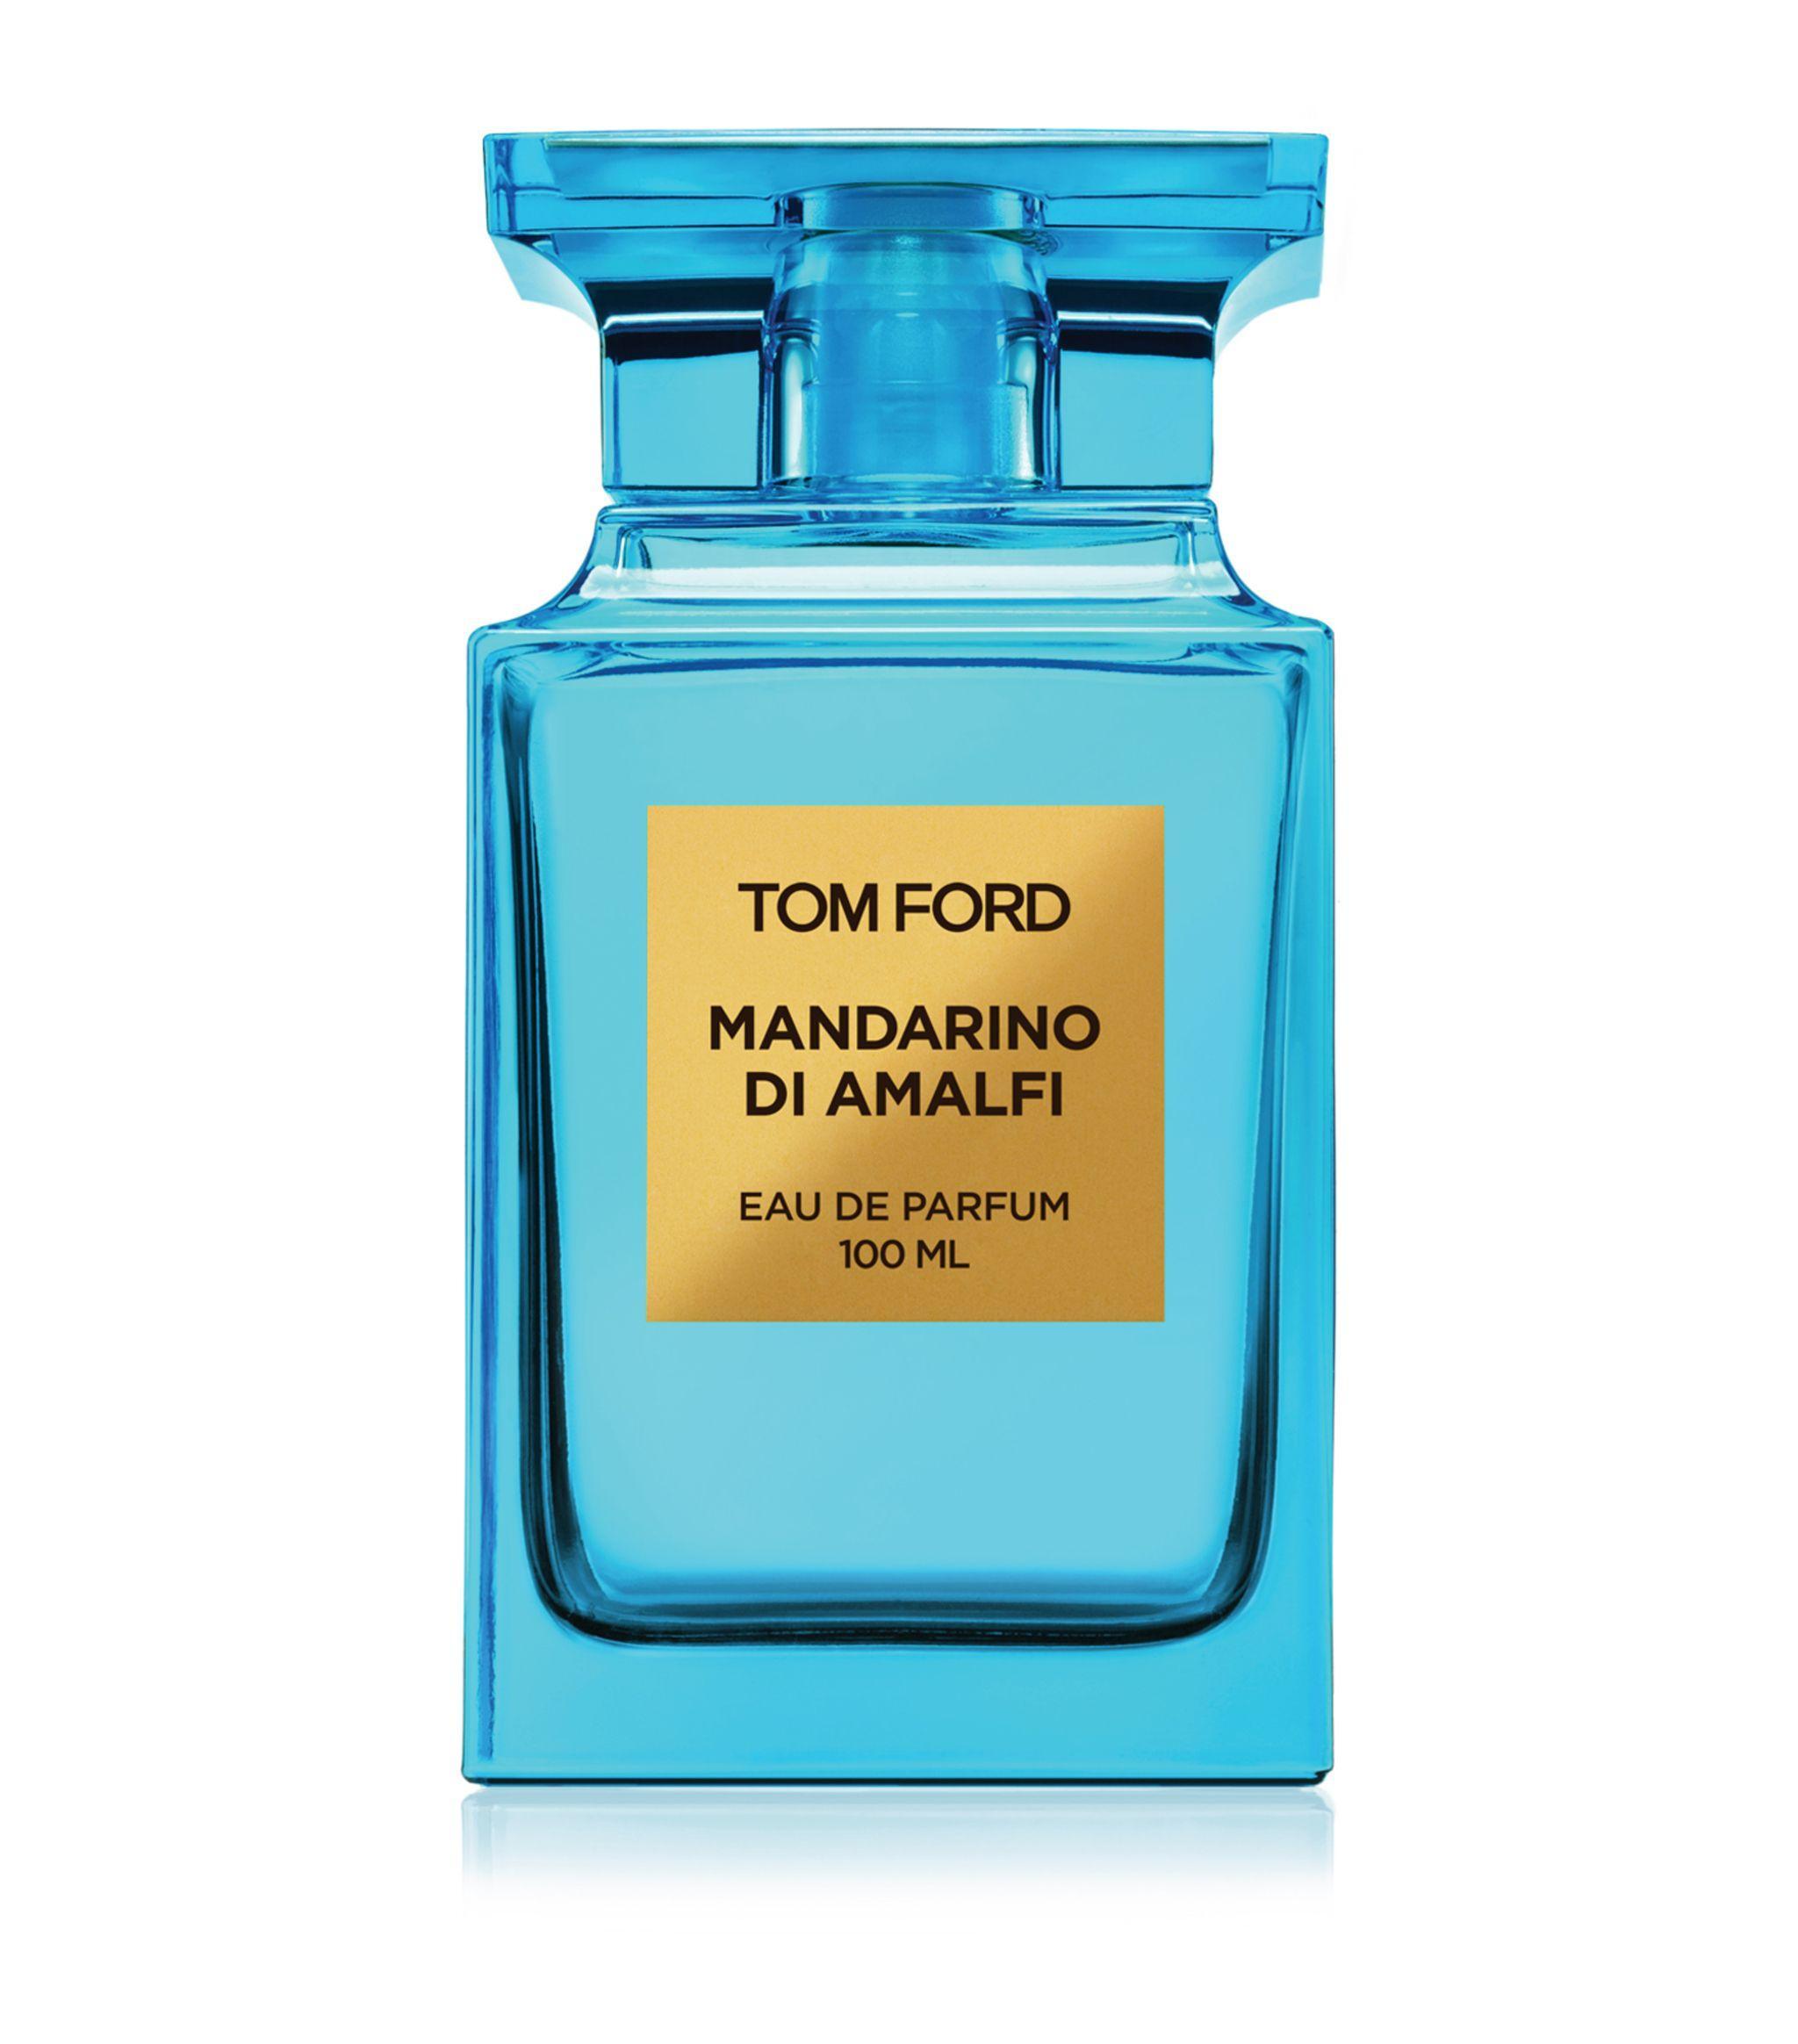 Tom Ford Mandarino Di Amalfi for Unisex Eau De Parfum 100ML